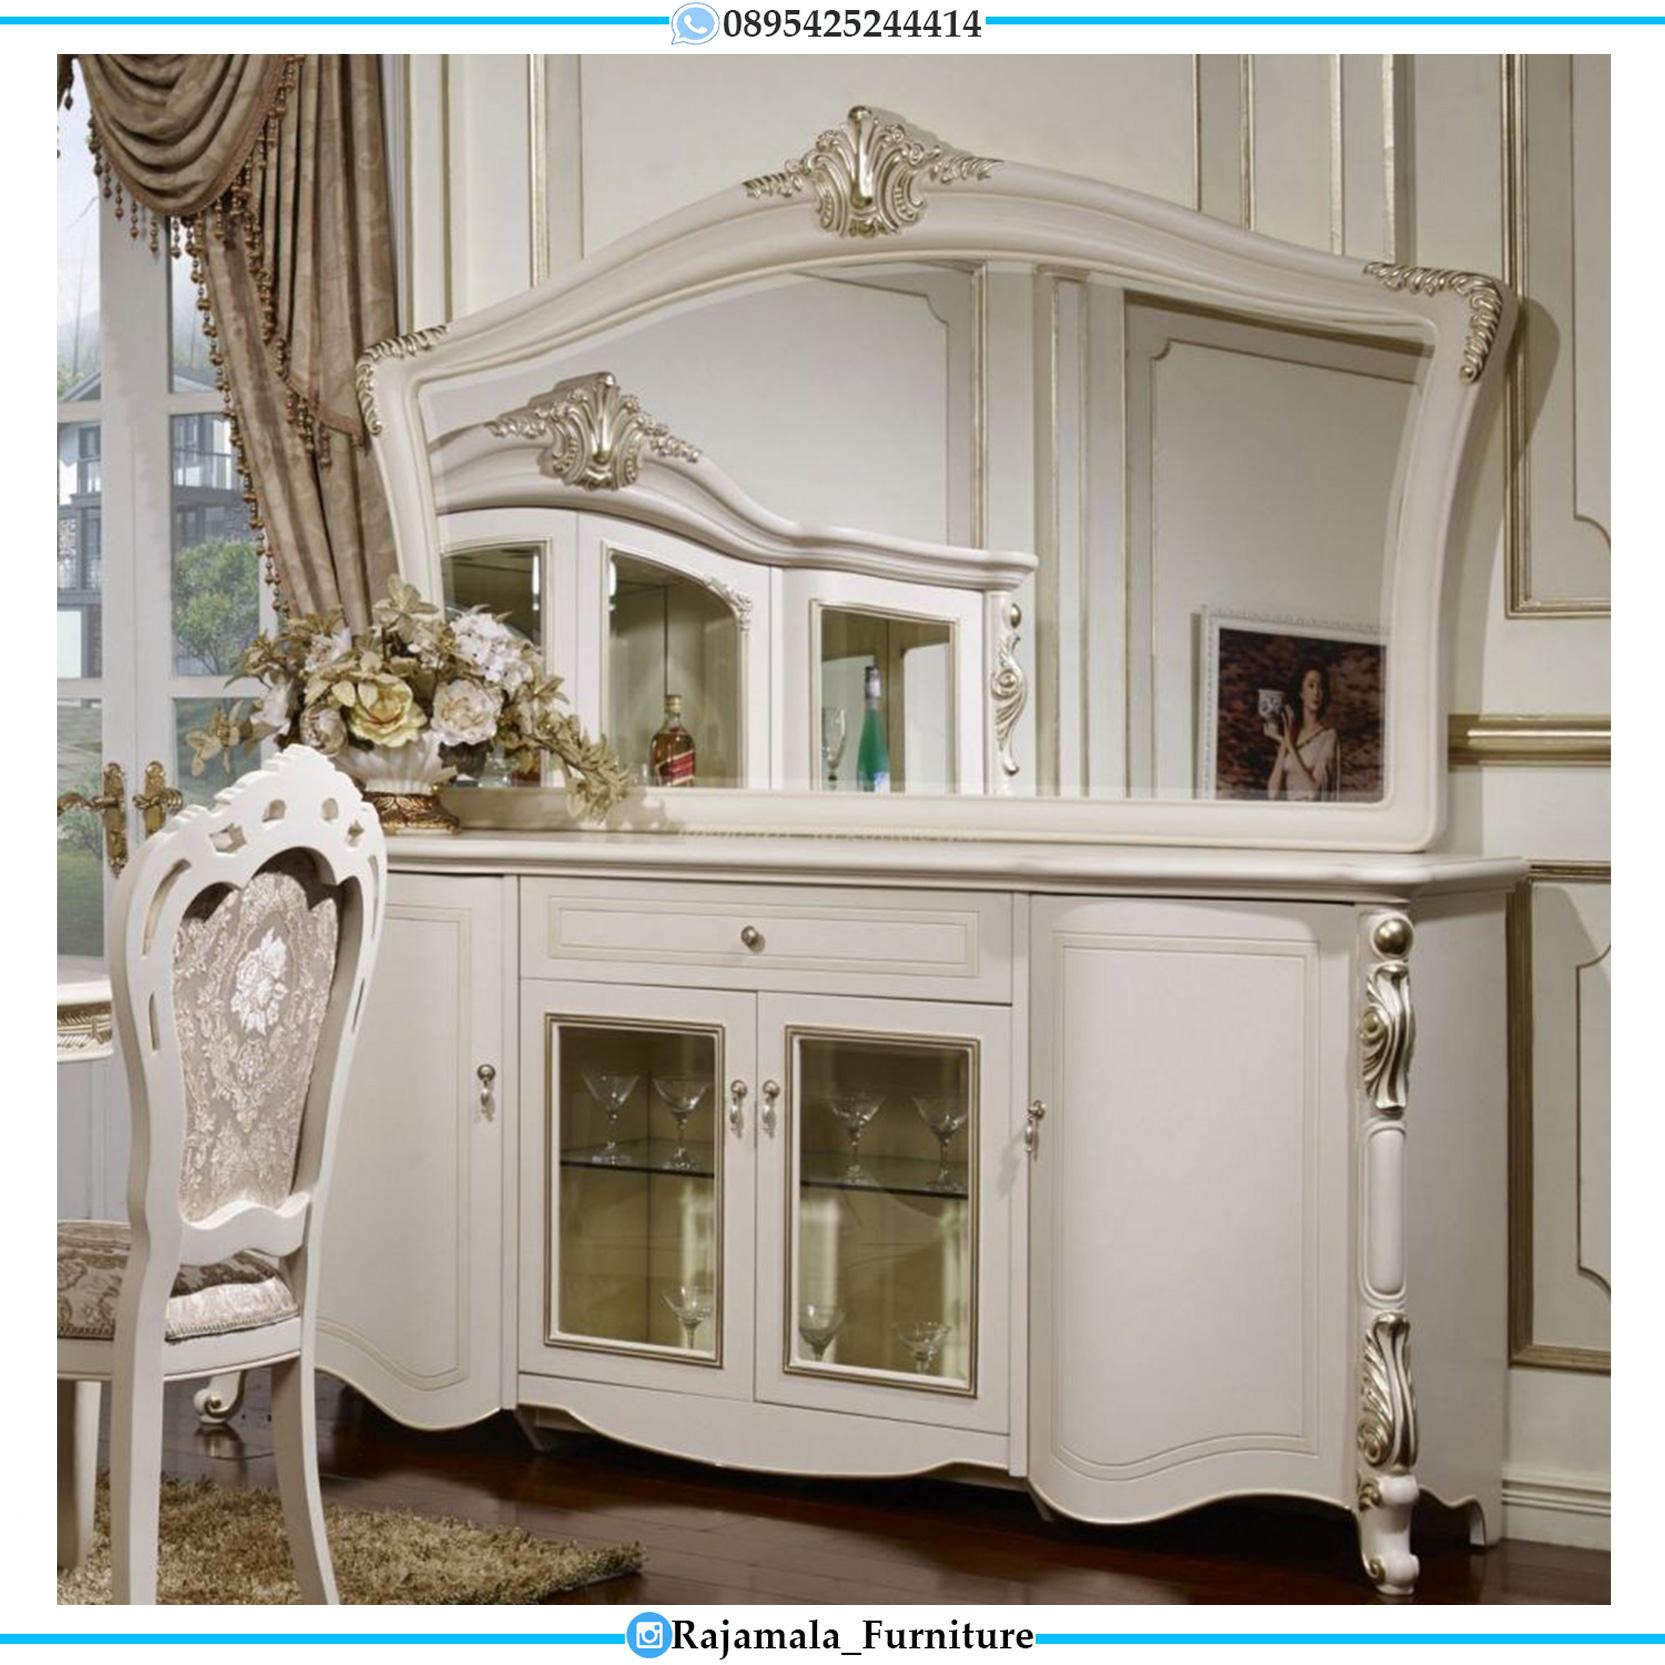 Meja Hias Bunga Desain Luxury Living Room Inspiring RM-0106